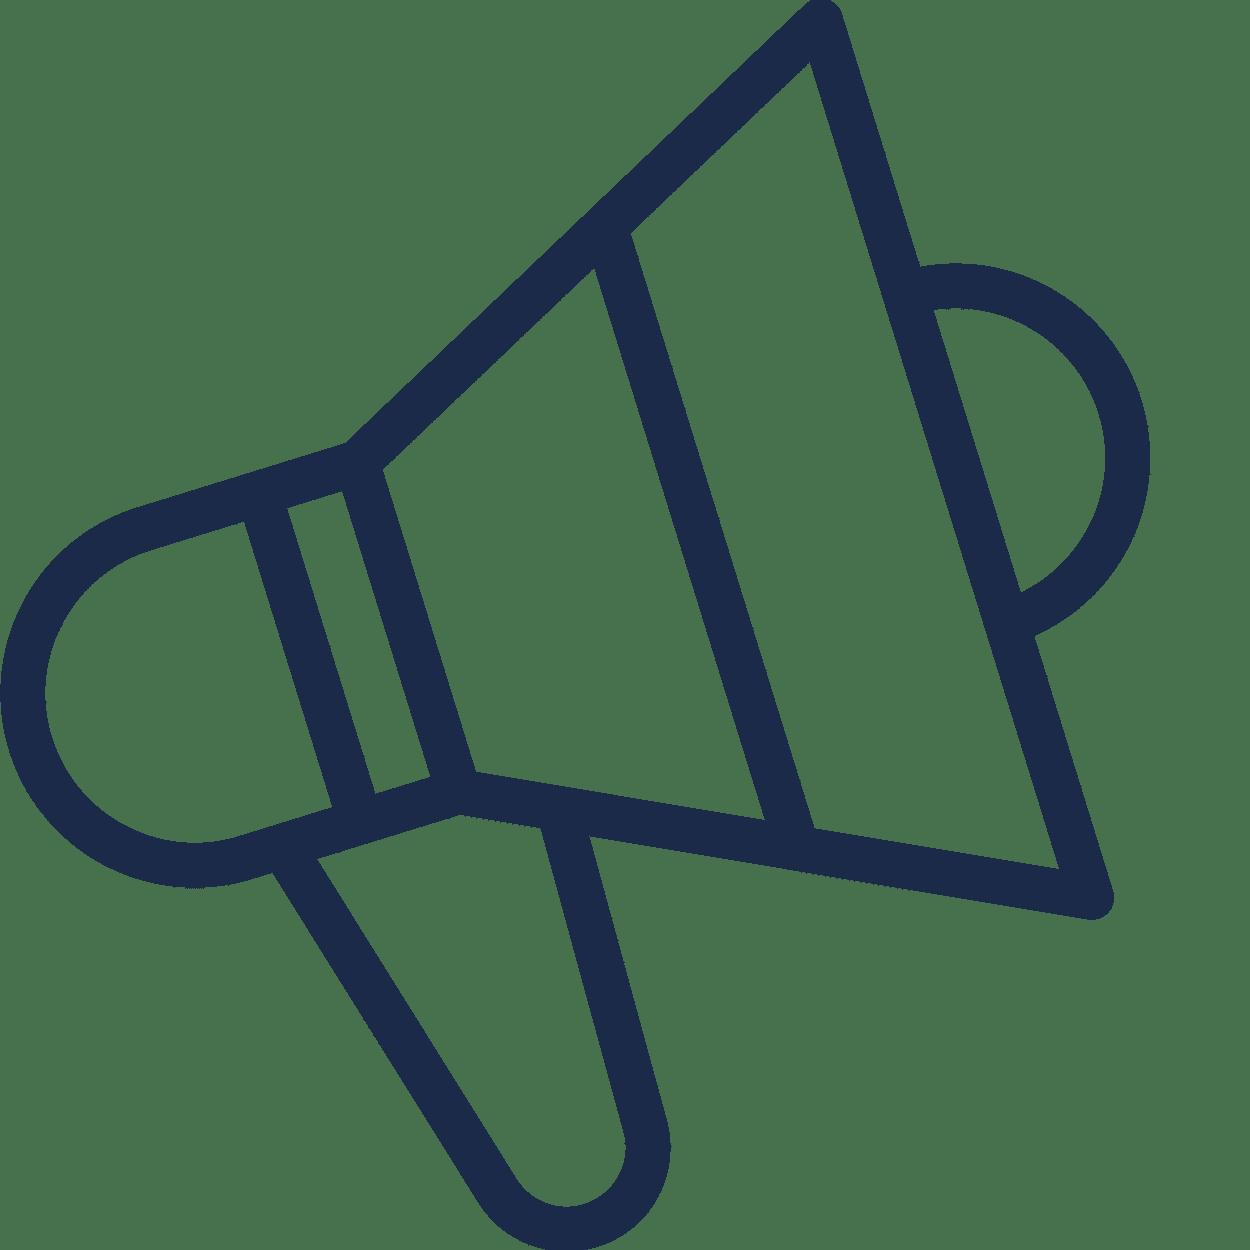 Mattfull marknadsforing icon